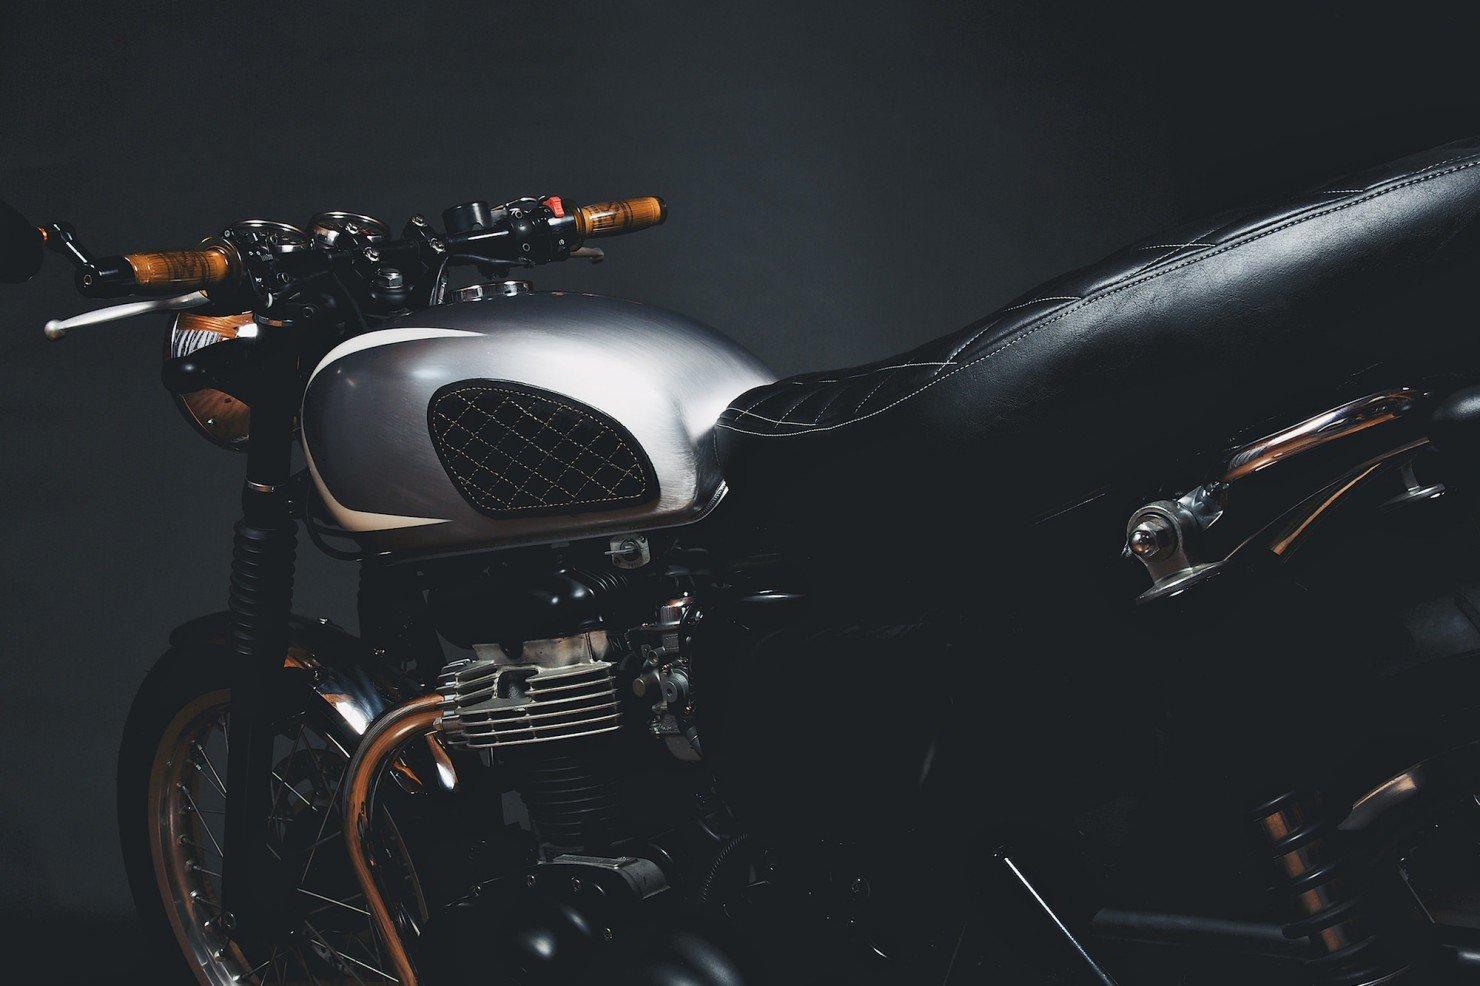 Kawasaki W650 Motorcycle 1 1480x986 Kawasaki W650